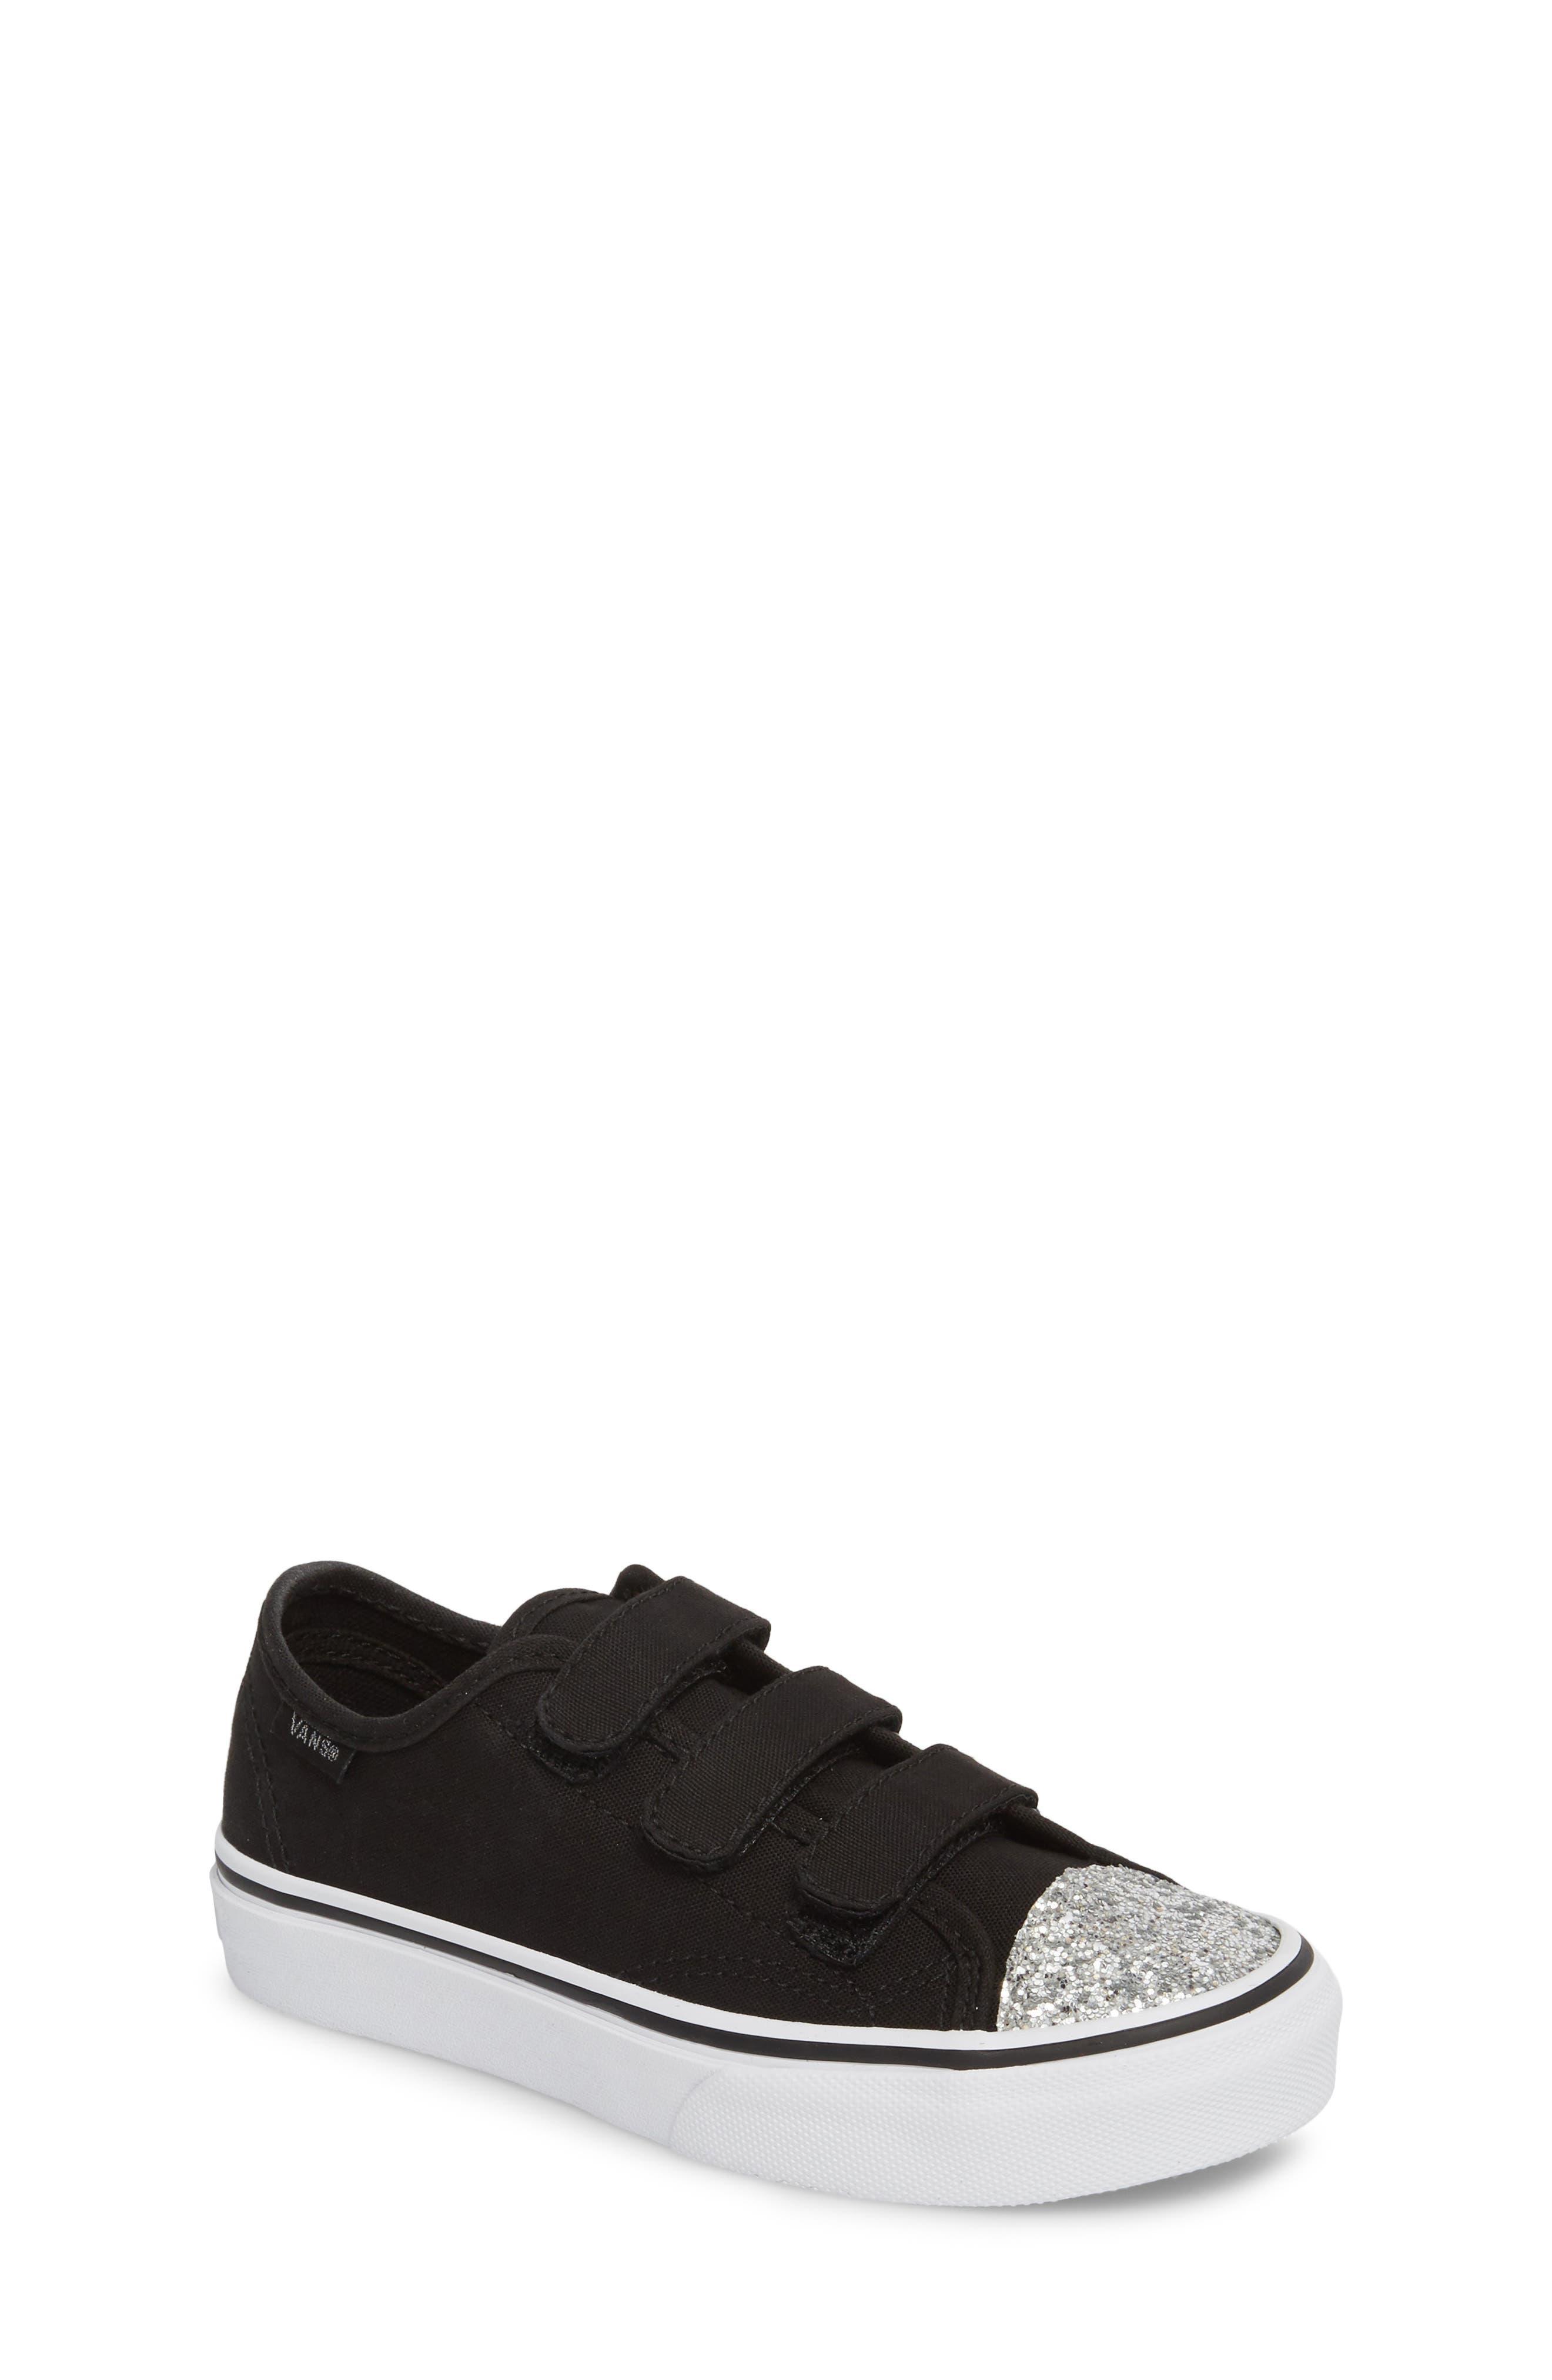 Style 23 V Sneaker,                             Main thumbnail 1, color,                             001